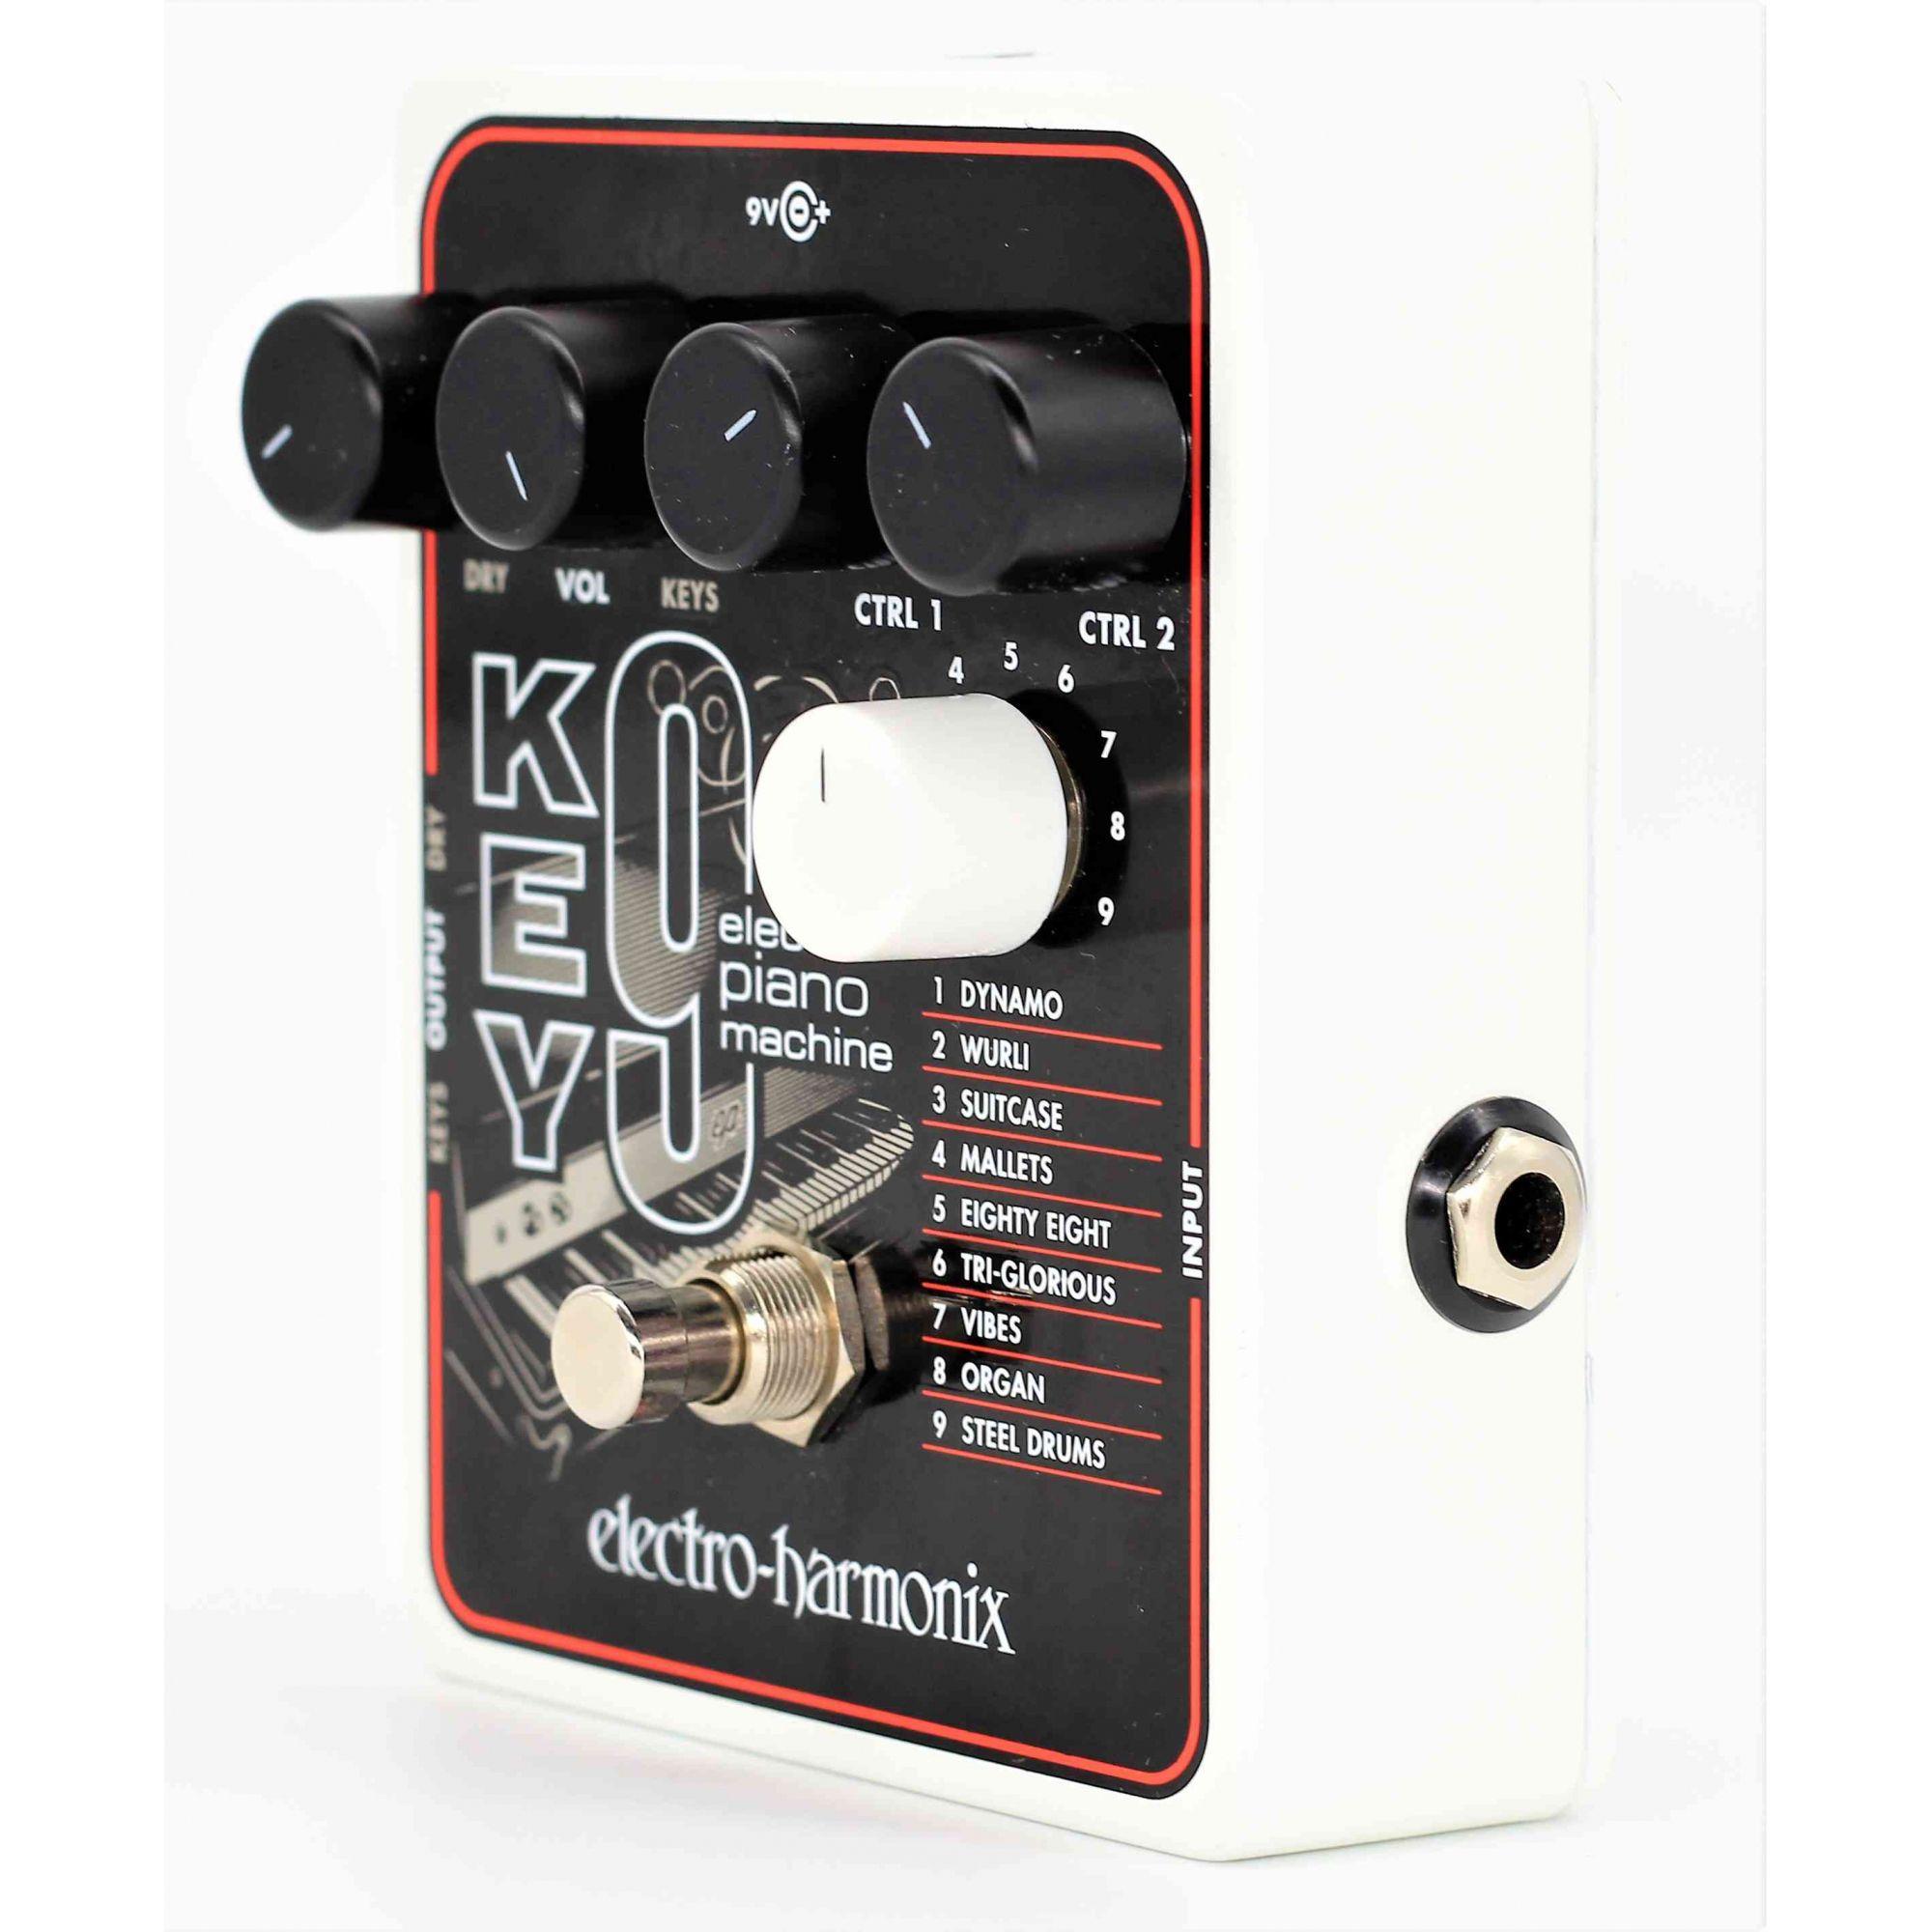 Electro-harmonix Key 9 Seminovo